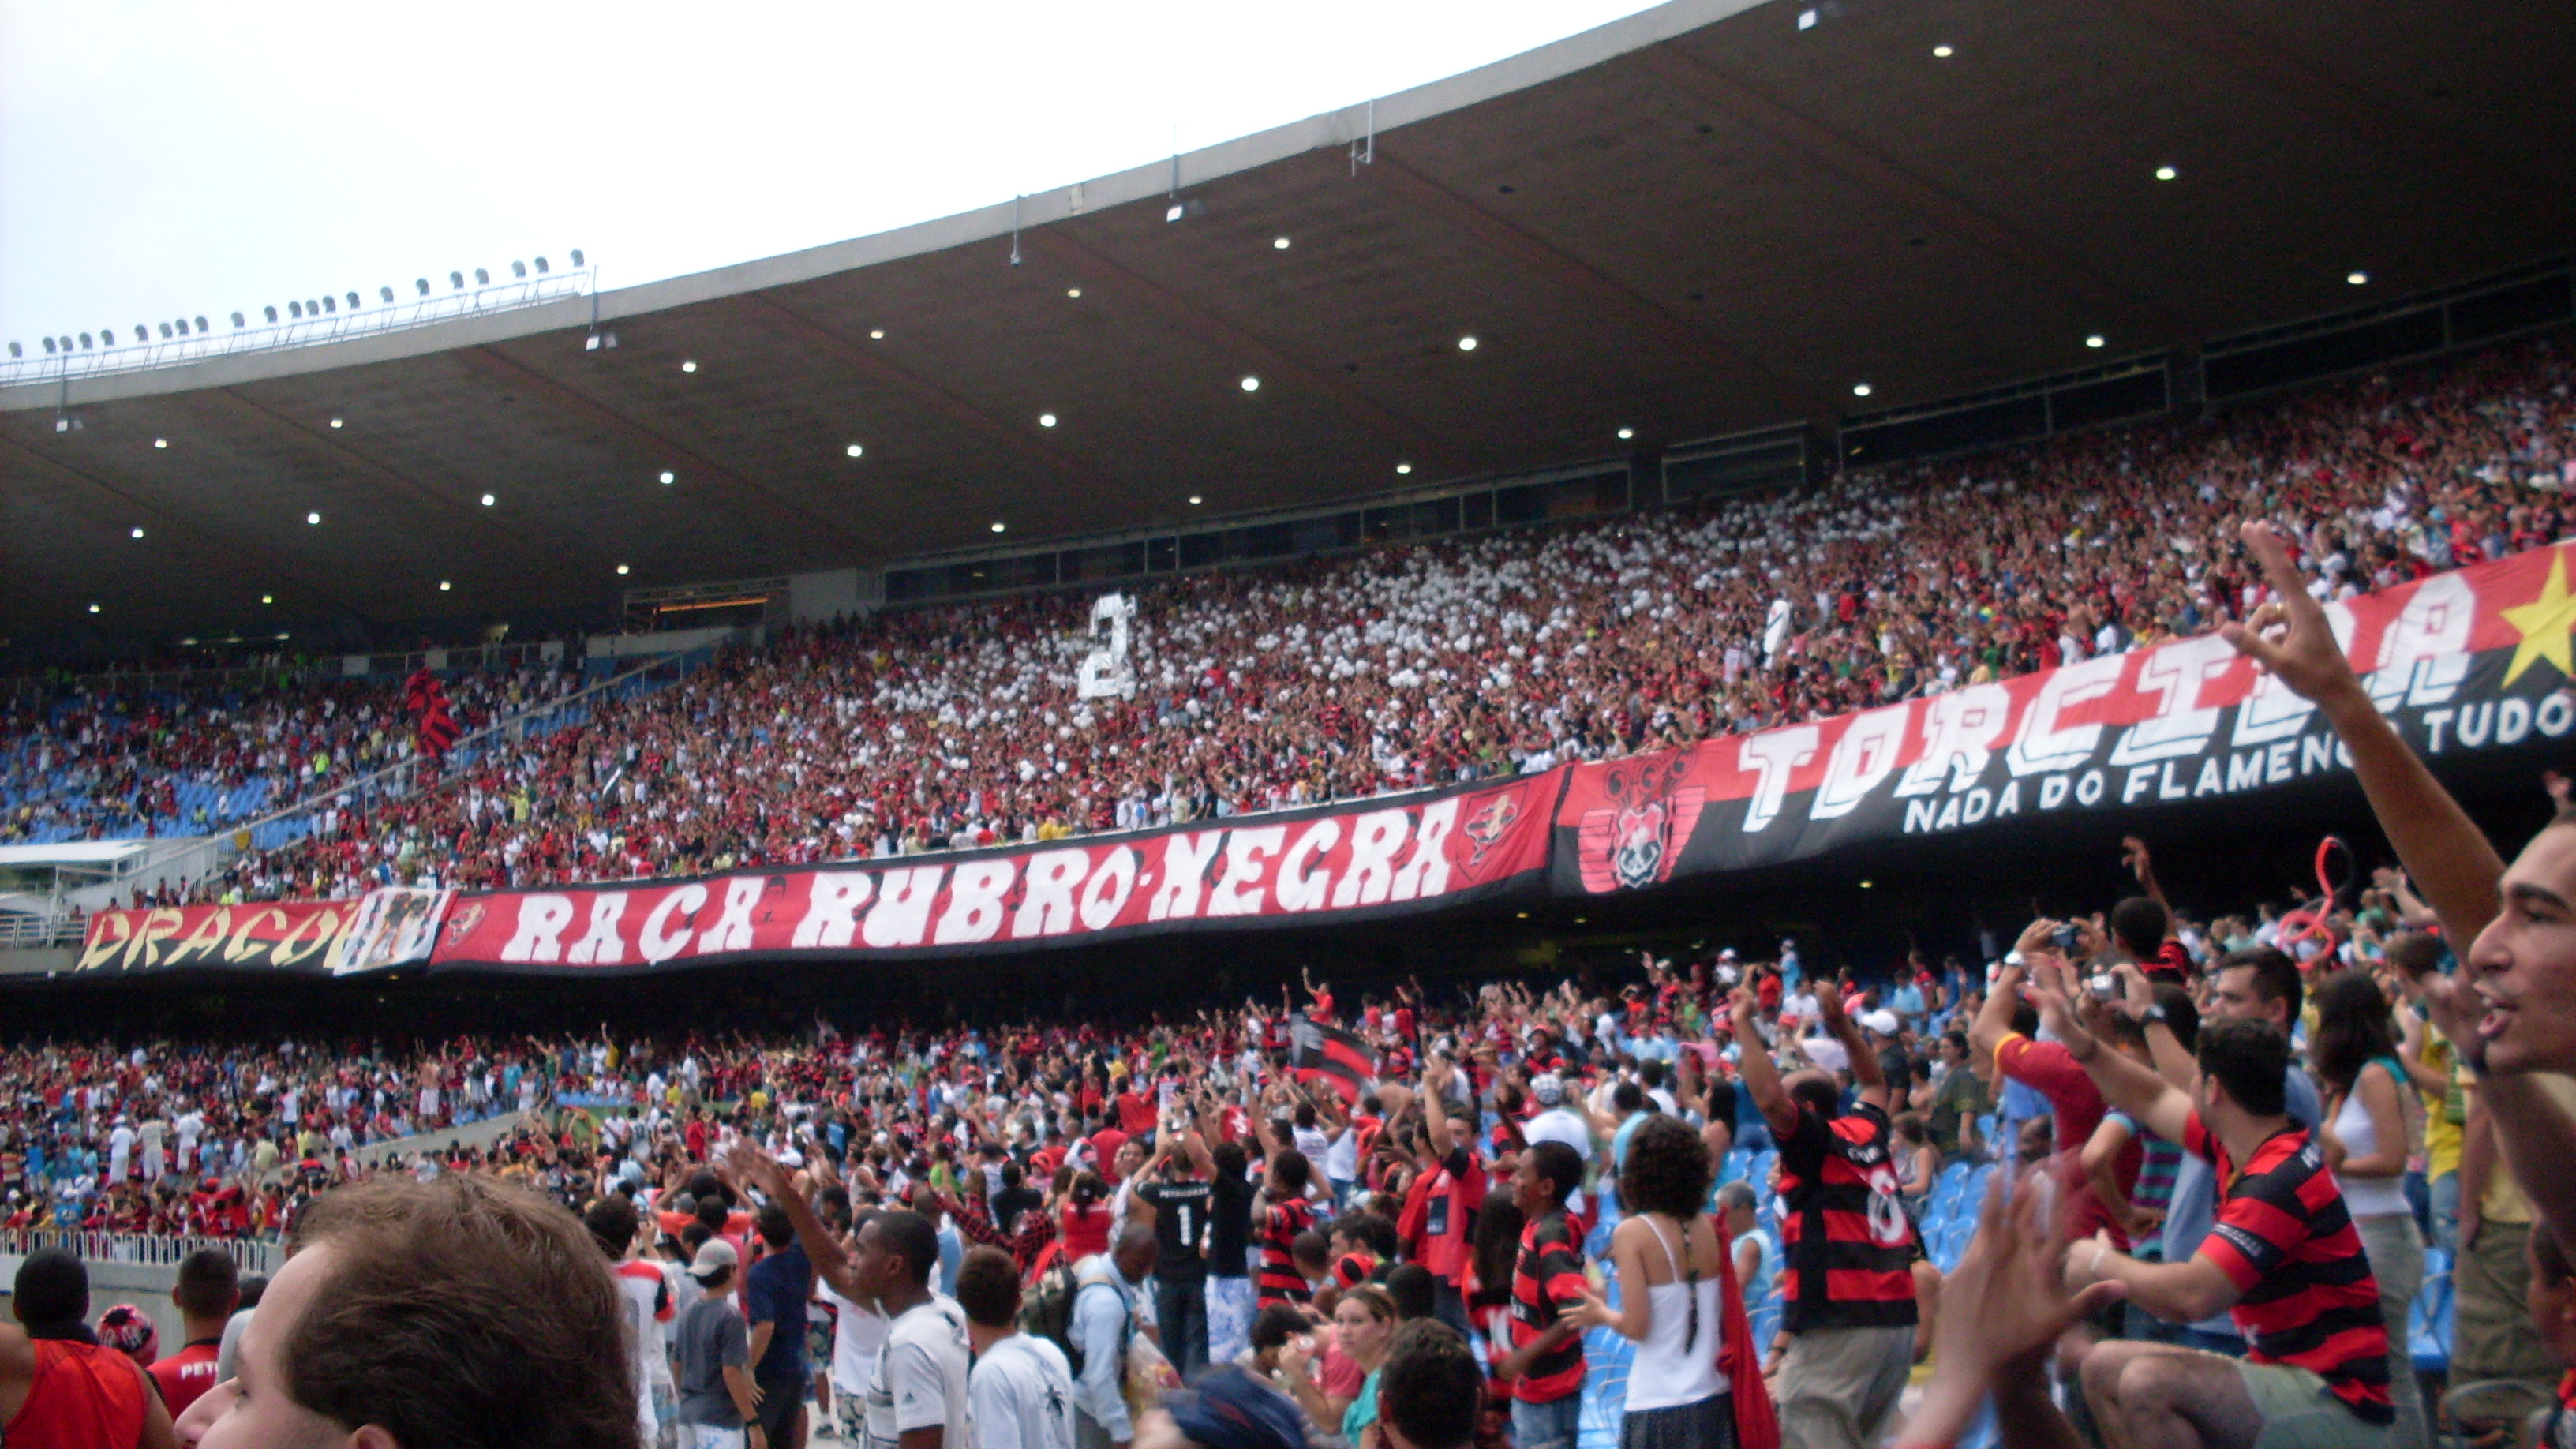 Ver Partido: Flamengo vs América Natal (15 de octubre) (A Que Hora Juegan)